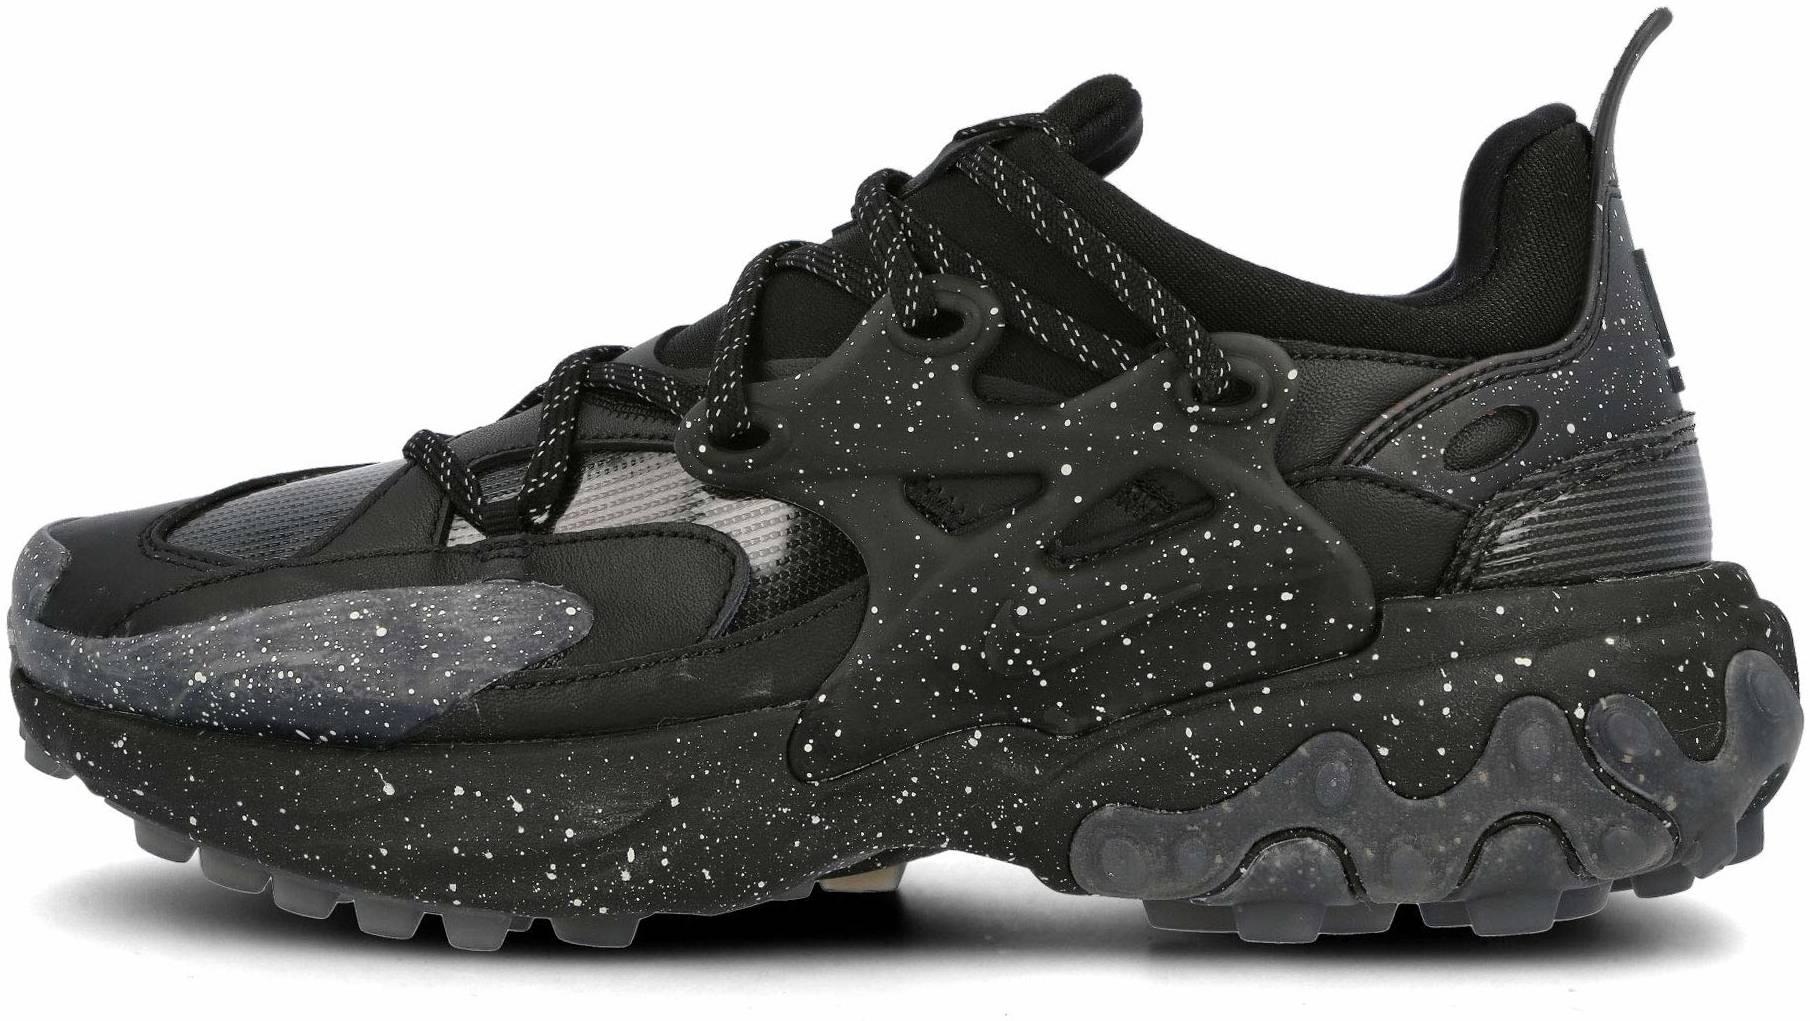 Nike React Presto Undercover sneakers in brown black   RunRepeat